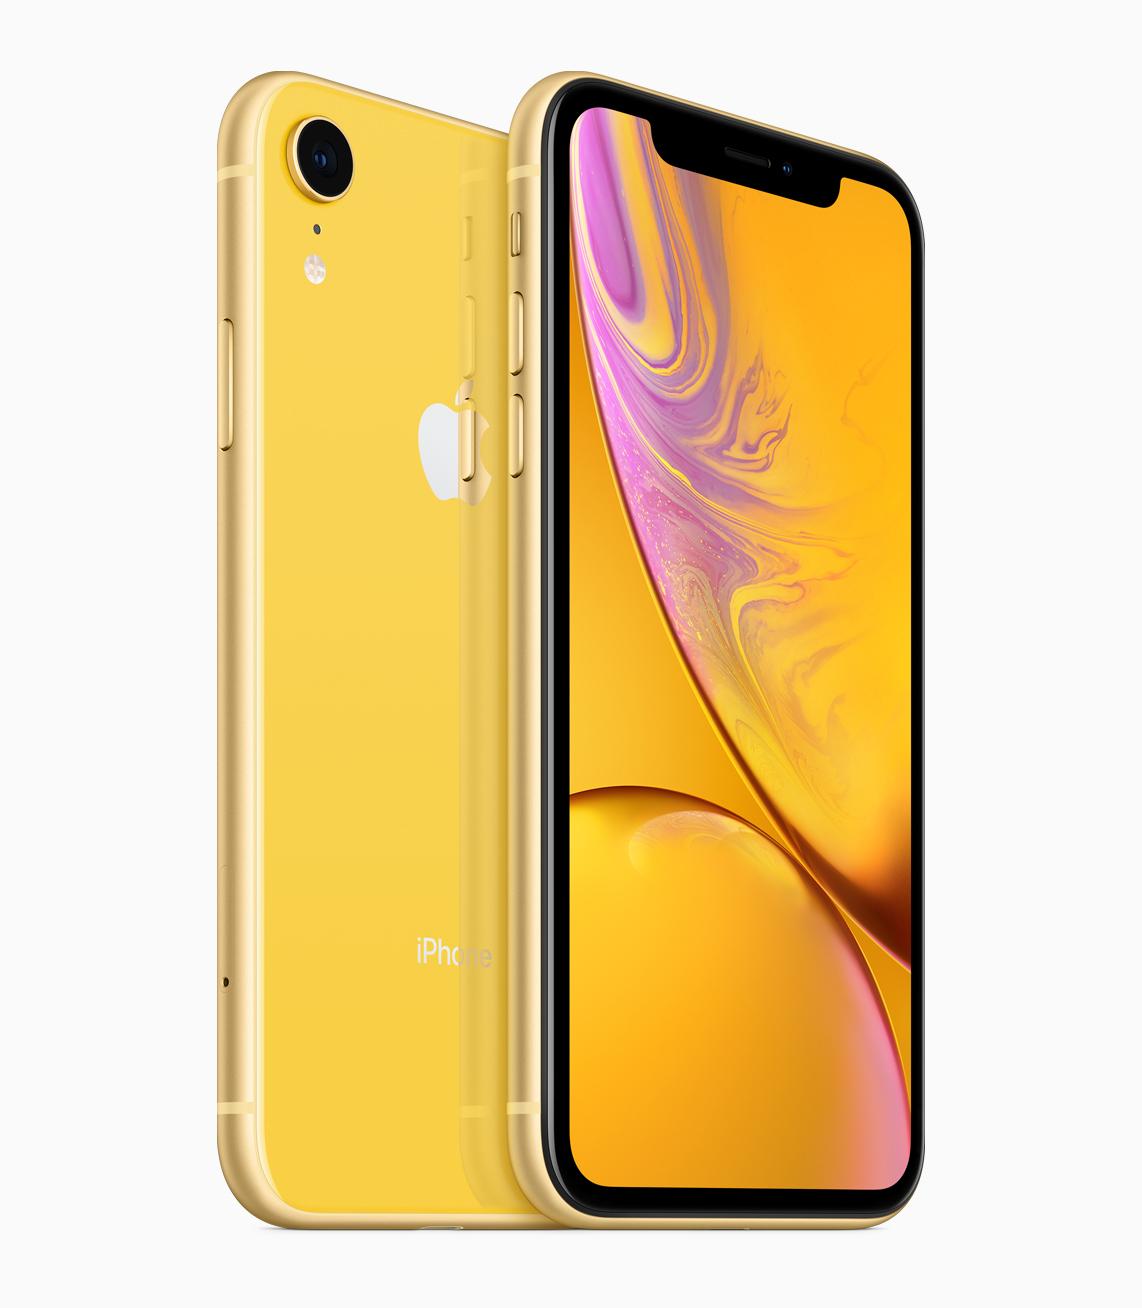 iPhone XR 128 GB in GELB